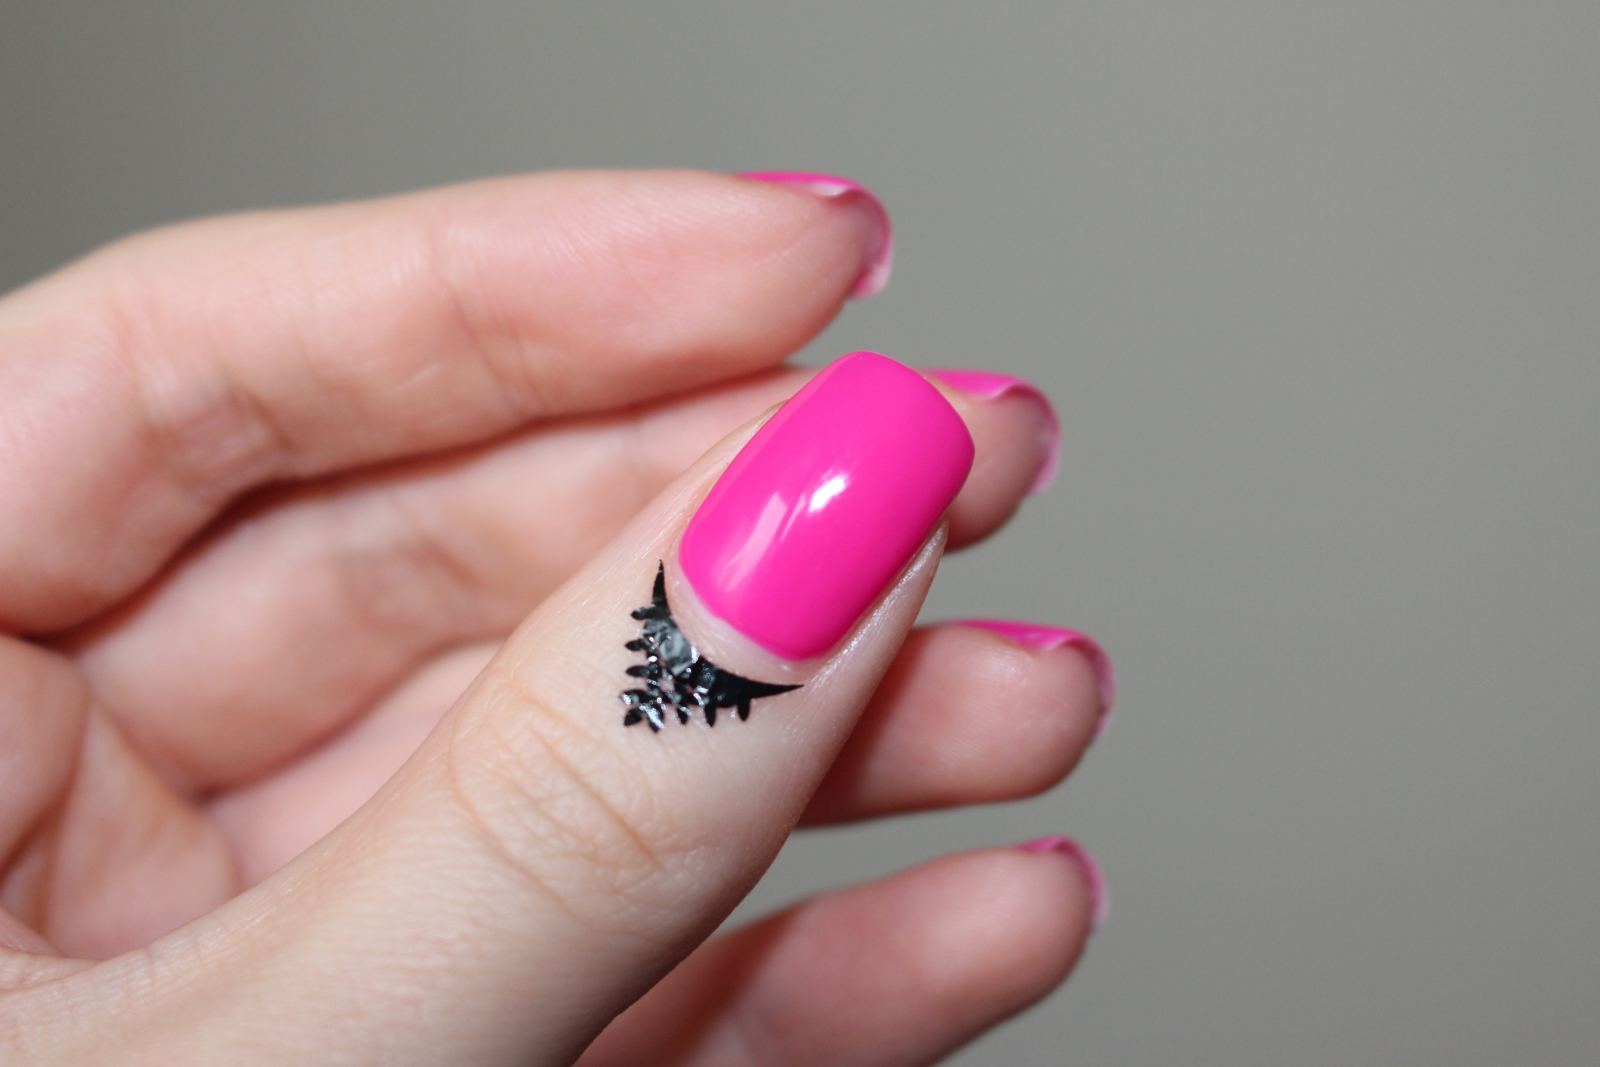 Lakier hybrydowy Semilac 121 Ruby Charm różowe paznockie hybrydy pank hola 1 Sheet Cuticle Tattoo Nail Art Stickers Water Transfer Temporary Decals Lace Flower Patterns paola